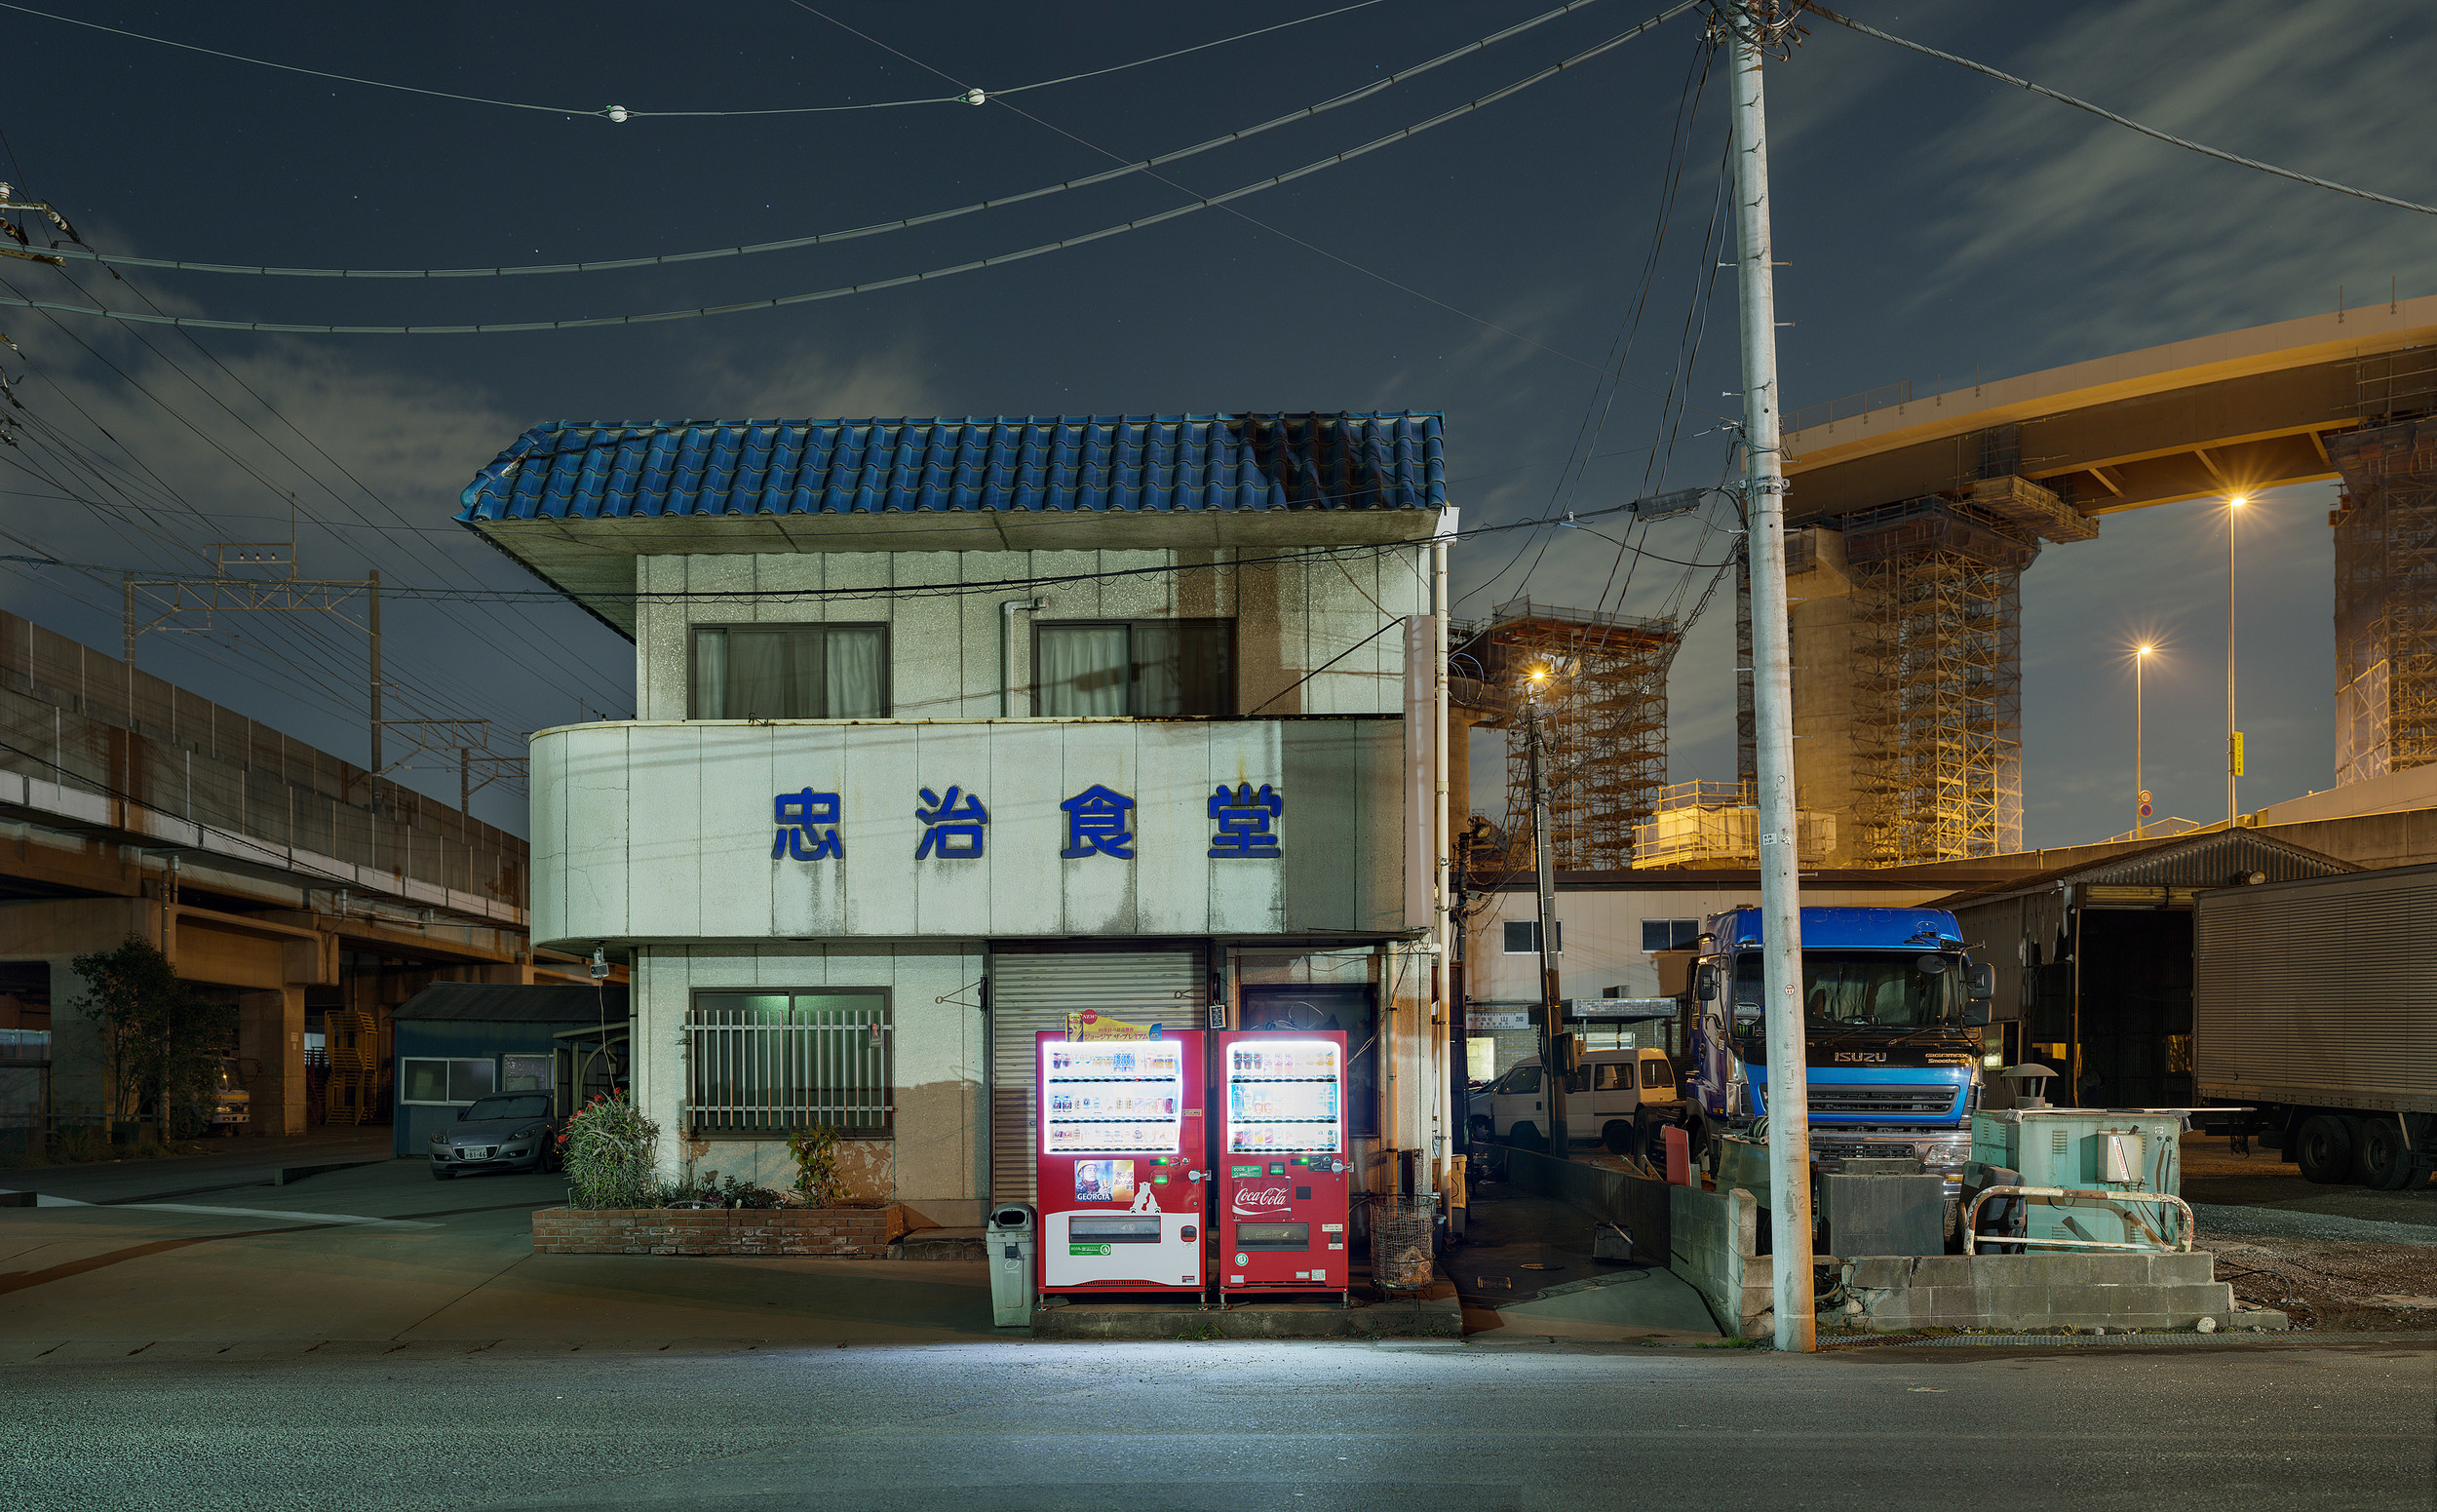 "Tokyo Industrial - 写真展展示作品""Tokyo Industrial=工業都市としての東京""を撮影し始めた当初は、眠らない街の夜の神秘と世界最大の都市の活力源となっている工業の巨大な力に魅了されていた。しかし夜の闇に潜む風景を探しながら撮影を続けていく中で、自分が捉えているものの正体は人間を支配し破壊しようとしているケダモノであることに気がついた。この殺風景なディストピアは、人類が産業の発展の末に辿り着いた世界である。その業績、進化、生み出す力は素晴らしいものであるが、なお成長を続ける世界は人類の最終的な崩壊が始まっていることを示唆してもいる。撮影中のある早朝、4時という時間にも関わらず連日24時間休みなく稼働を続ける化学工場の唸りと噴煙に包囲された自分が向かい合っているのは地球の消滅のサインであることに気付き、恐怖を禁じ得なかった。人の持つ征服欲、創造欲、そして支配欲は止めようがないことを恐ろしく思う。それらはこの地球を私たちが実際には望んでいない形の世界に変えてしまうだろう。そしてそれは取り返しがつかない。自分たちの作り上げてきたものの巨大さを享受する自分と、その意味するところに恐怖を感じる自分がいる。"